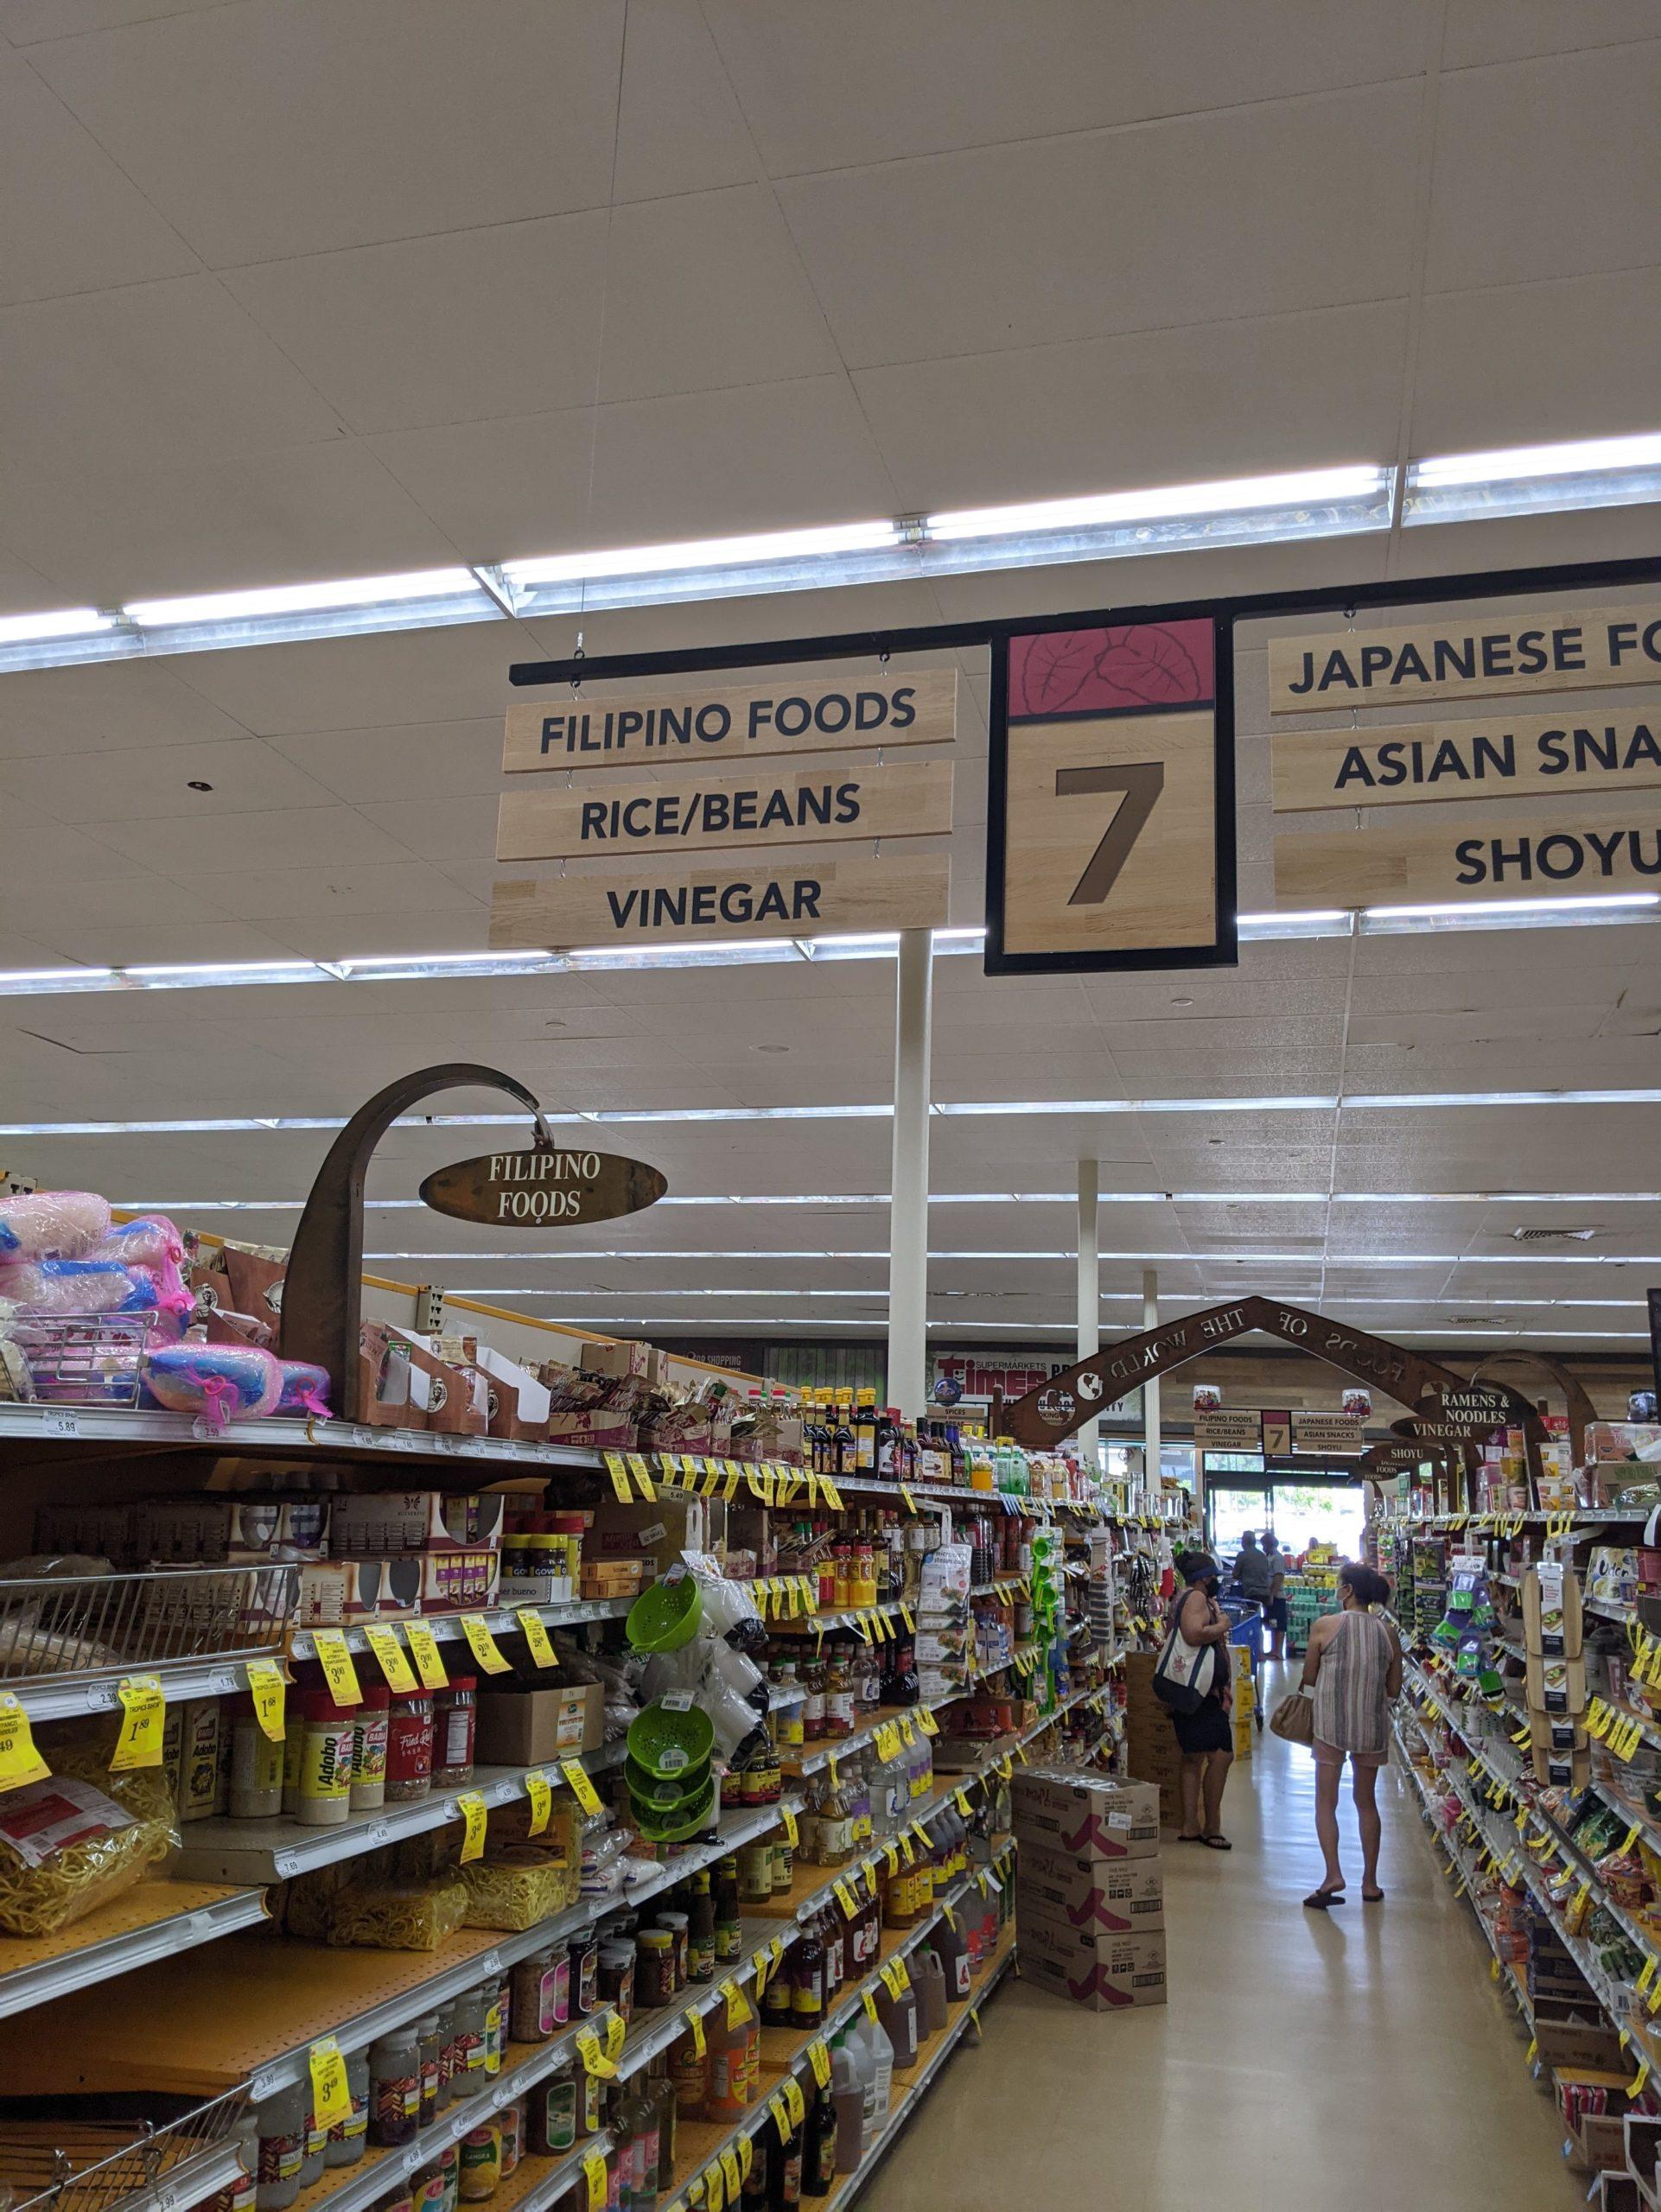 Filipino and Asian food aisle at Time Supermarket in Lihue, HI